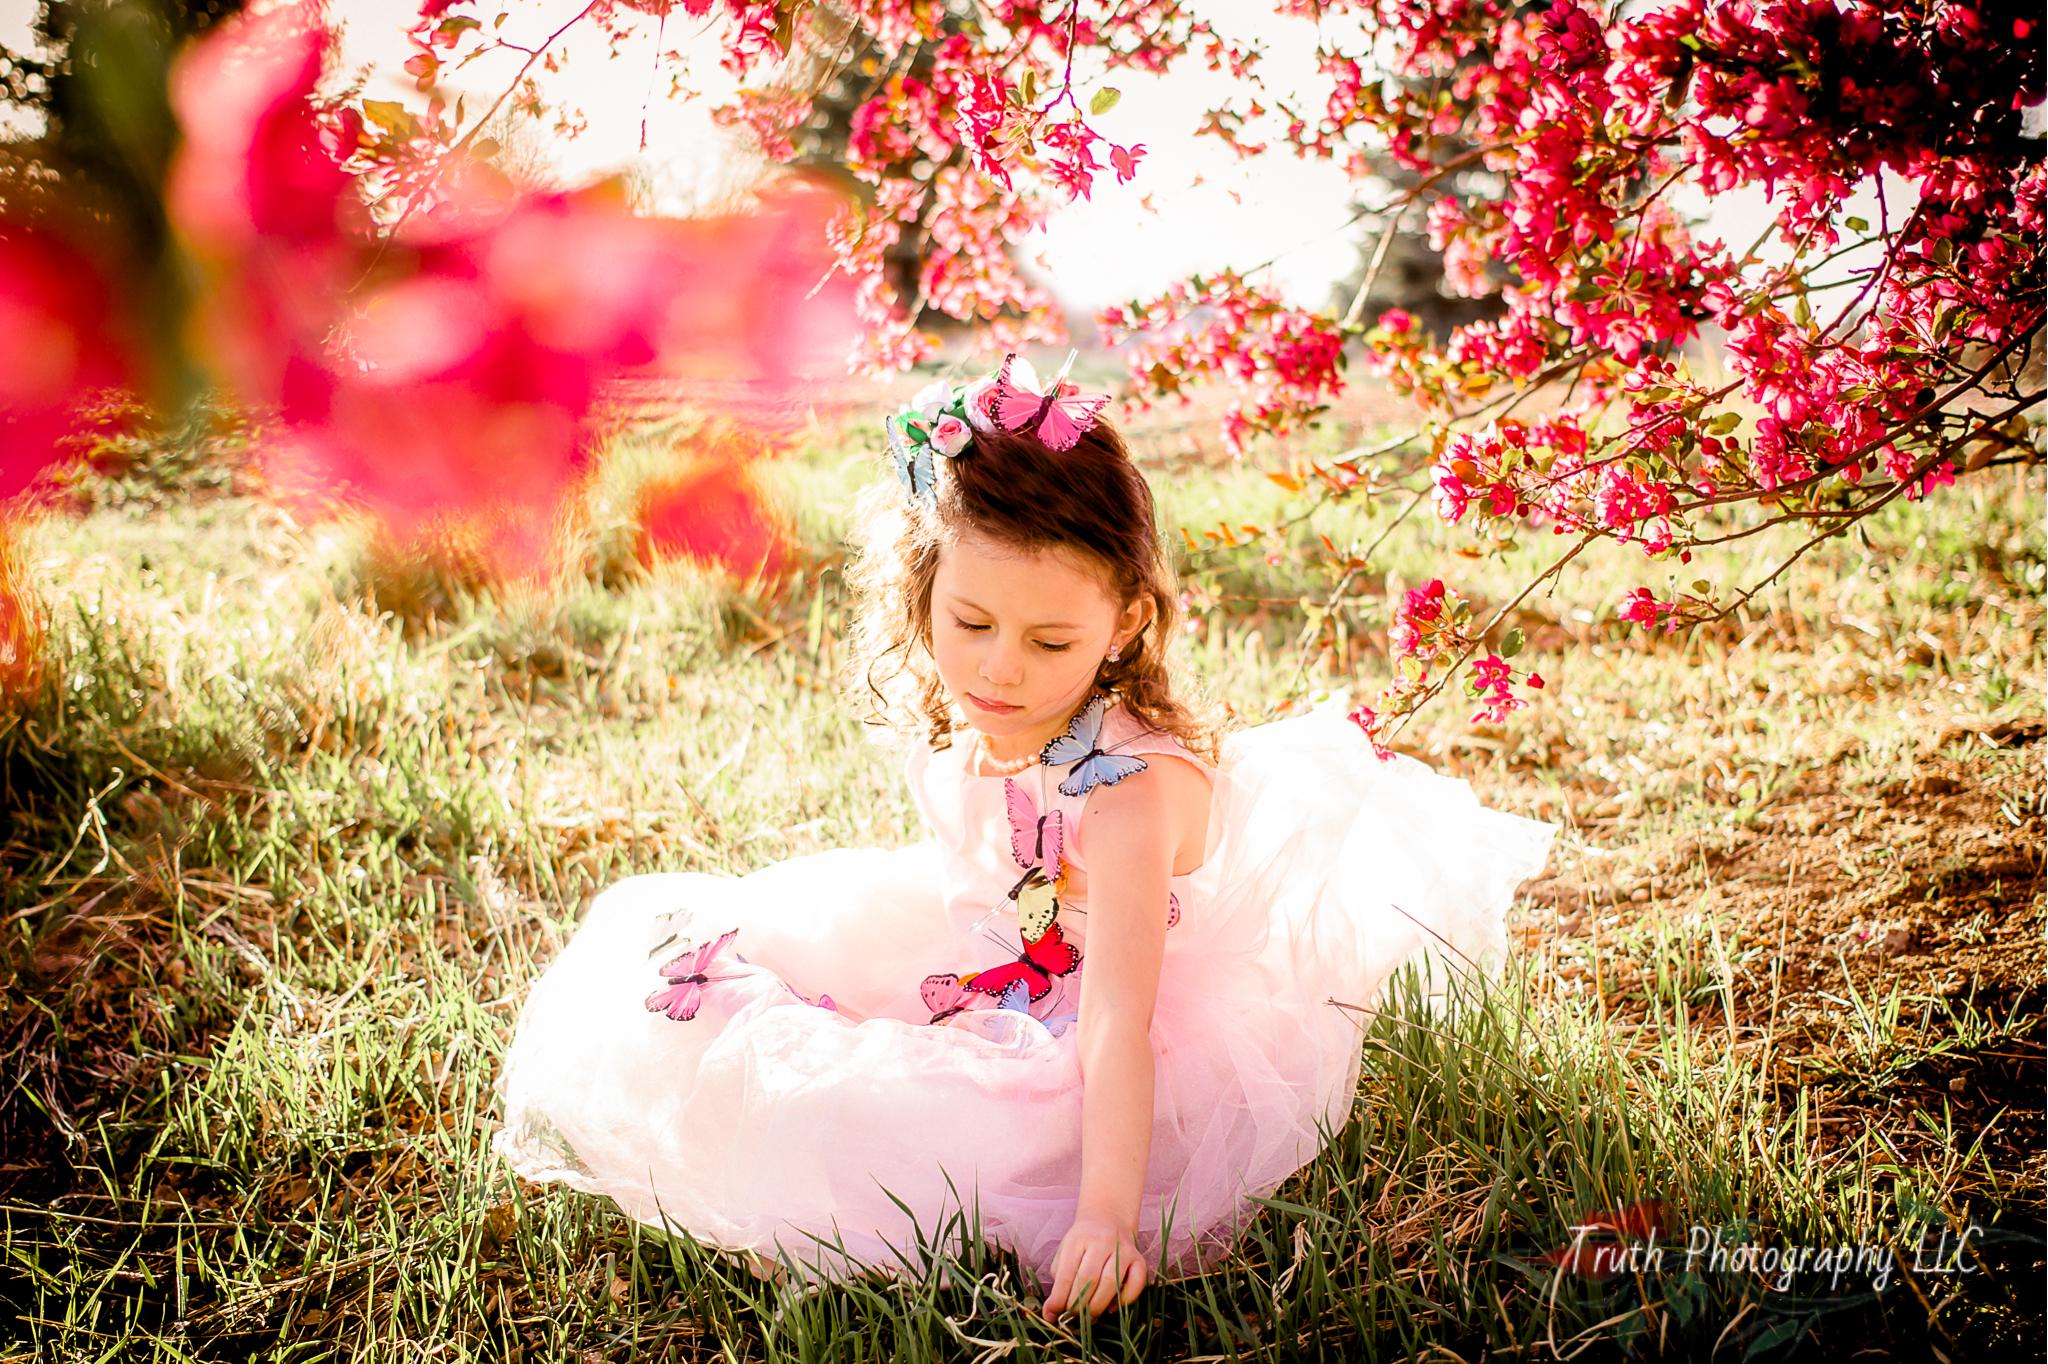 Truth-Photography-Northglenn-Colorado-kids-photographer.jpg